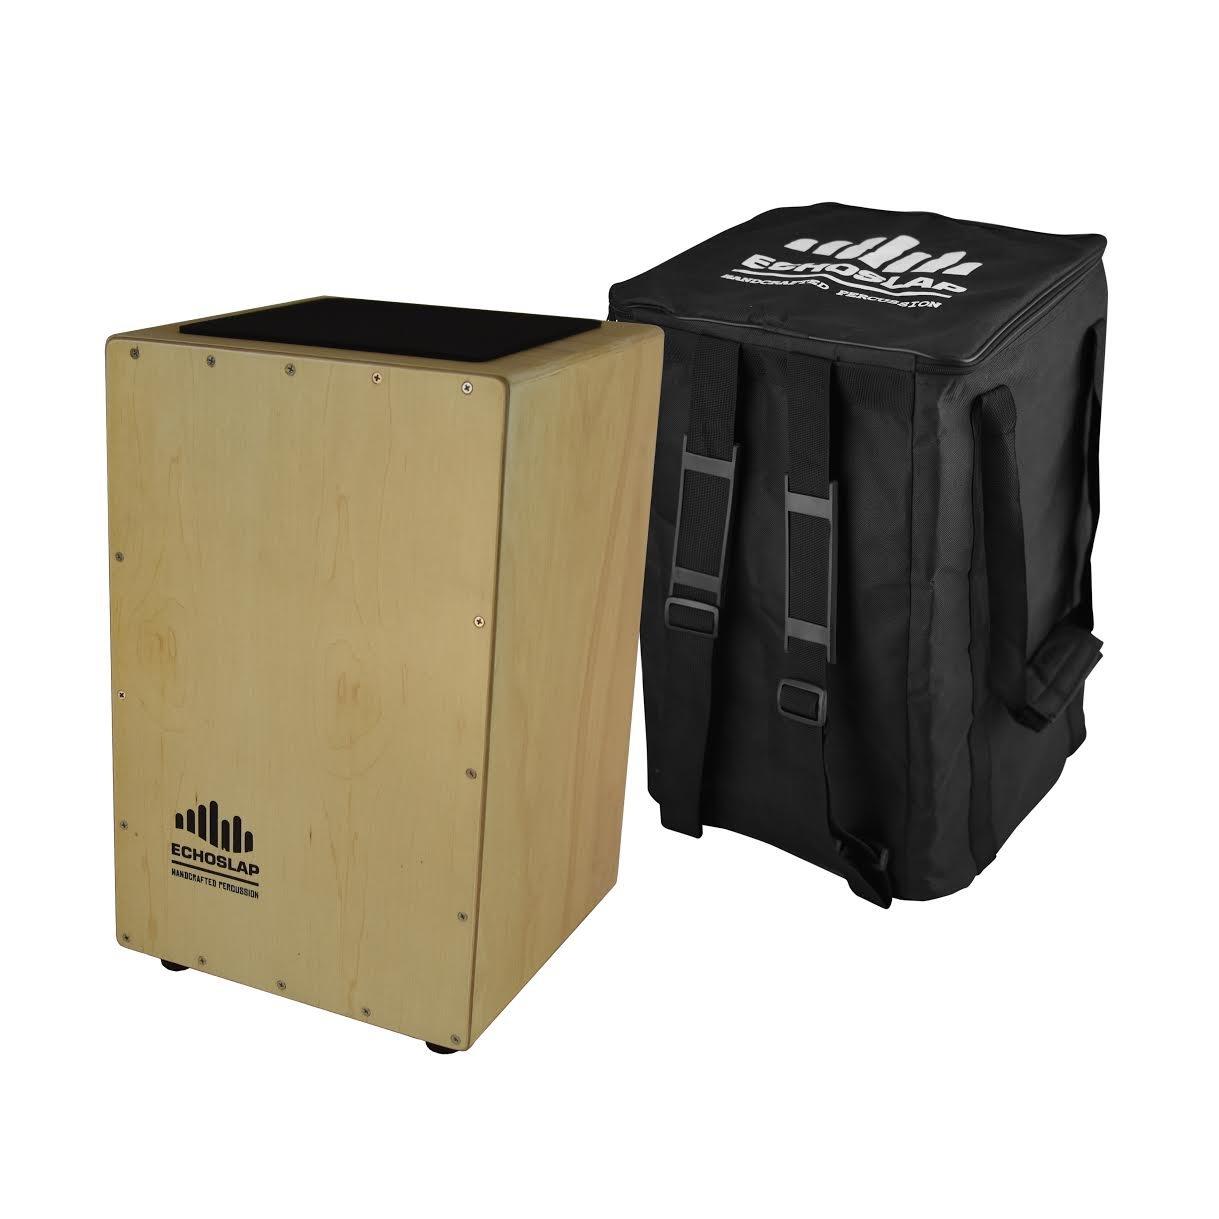 Echoslap Siam Oak Super Snare Cajon - Hand Tested, Siam Oak Body, Maple Frontplate Plus Free Gig Bag by CNZ Audio